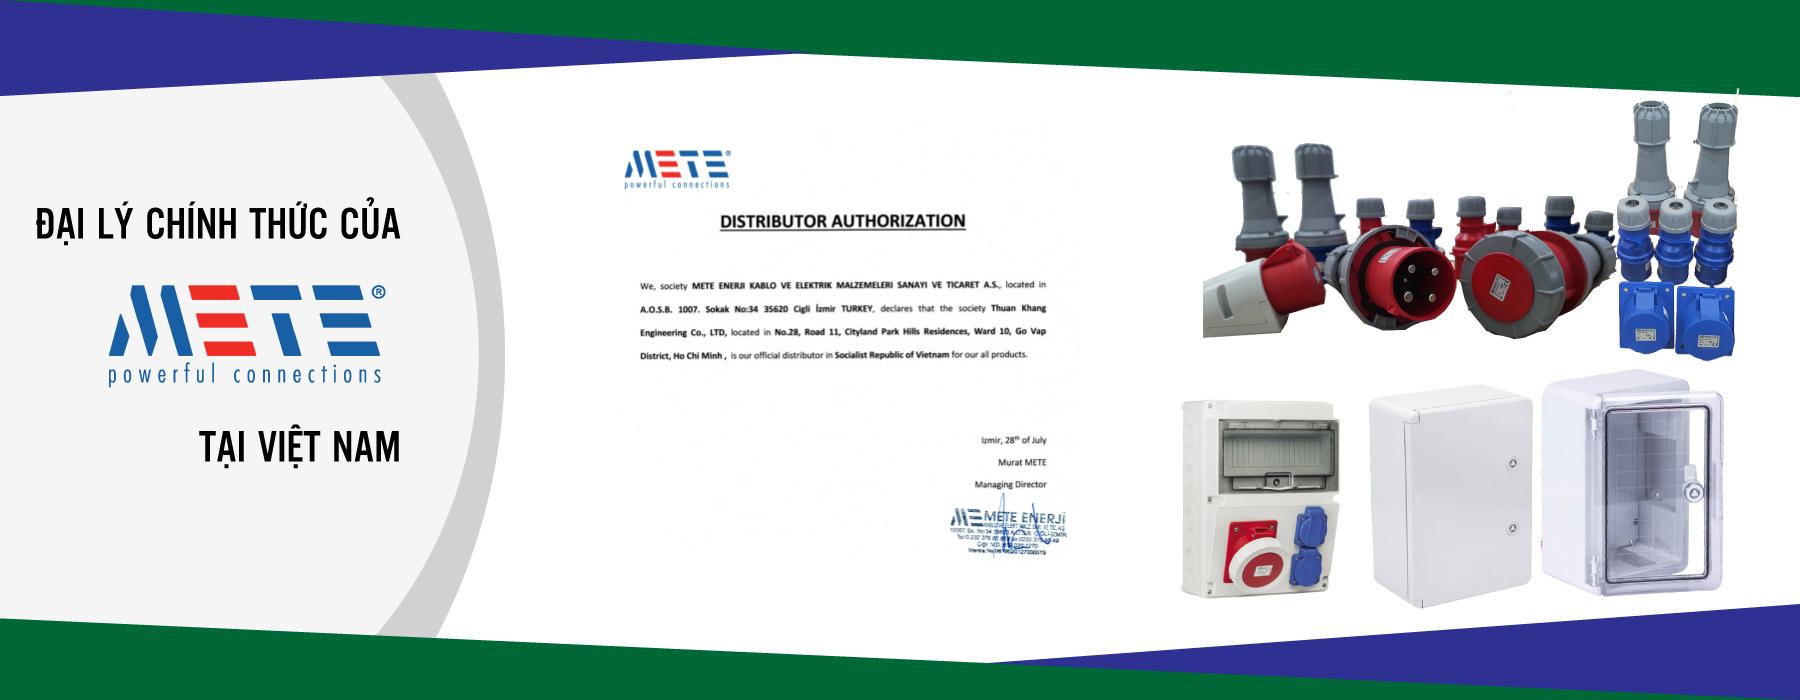 Distributor of Mete Ennerji in Vietnam